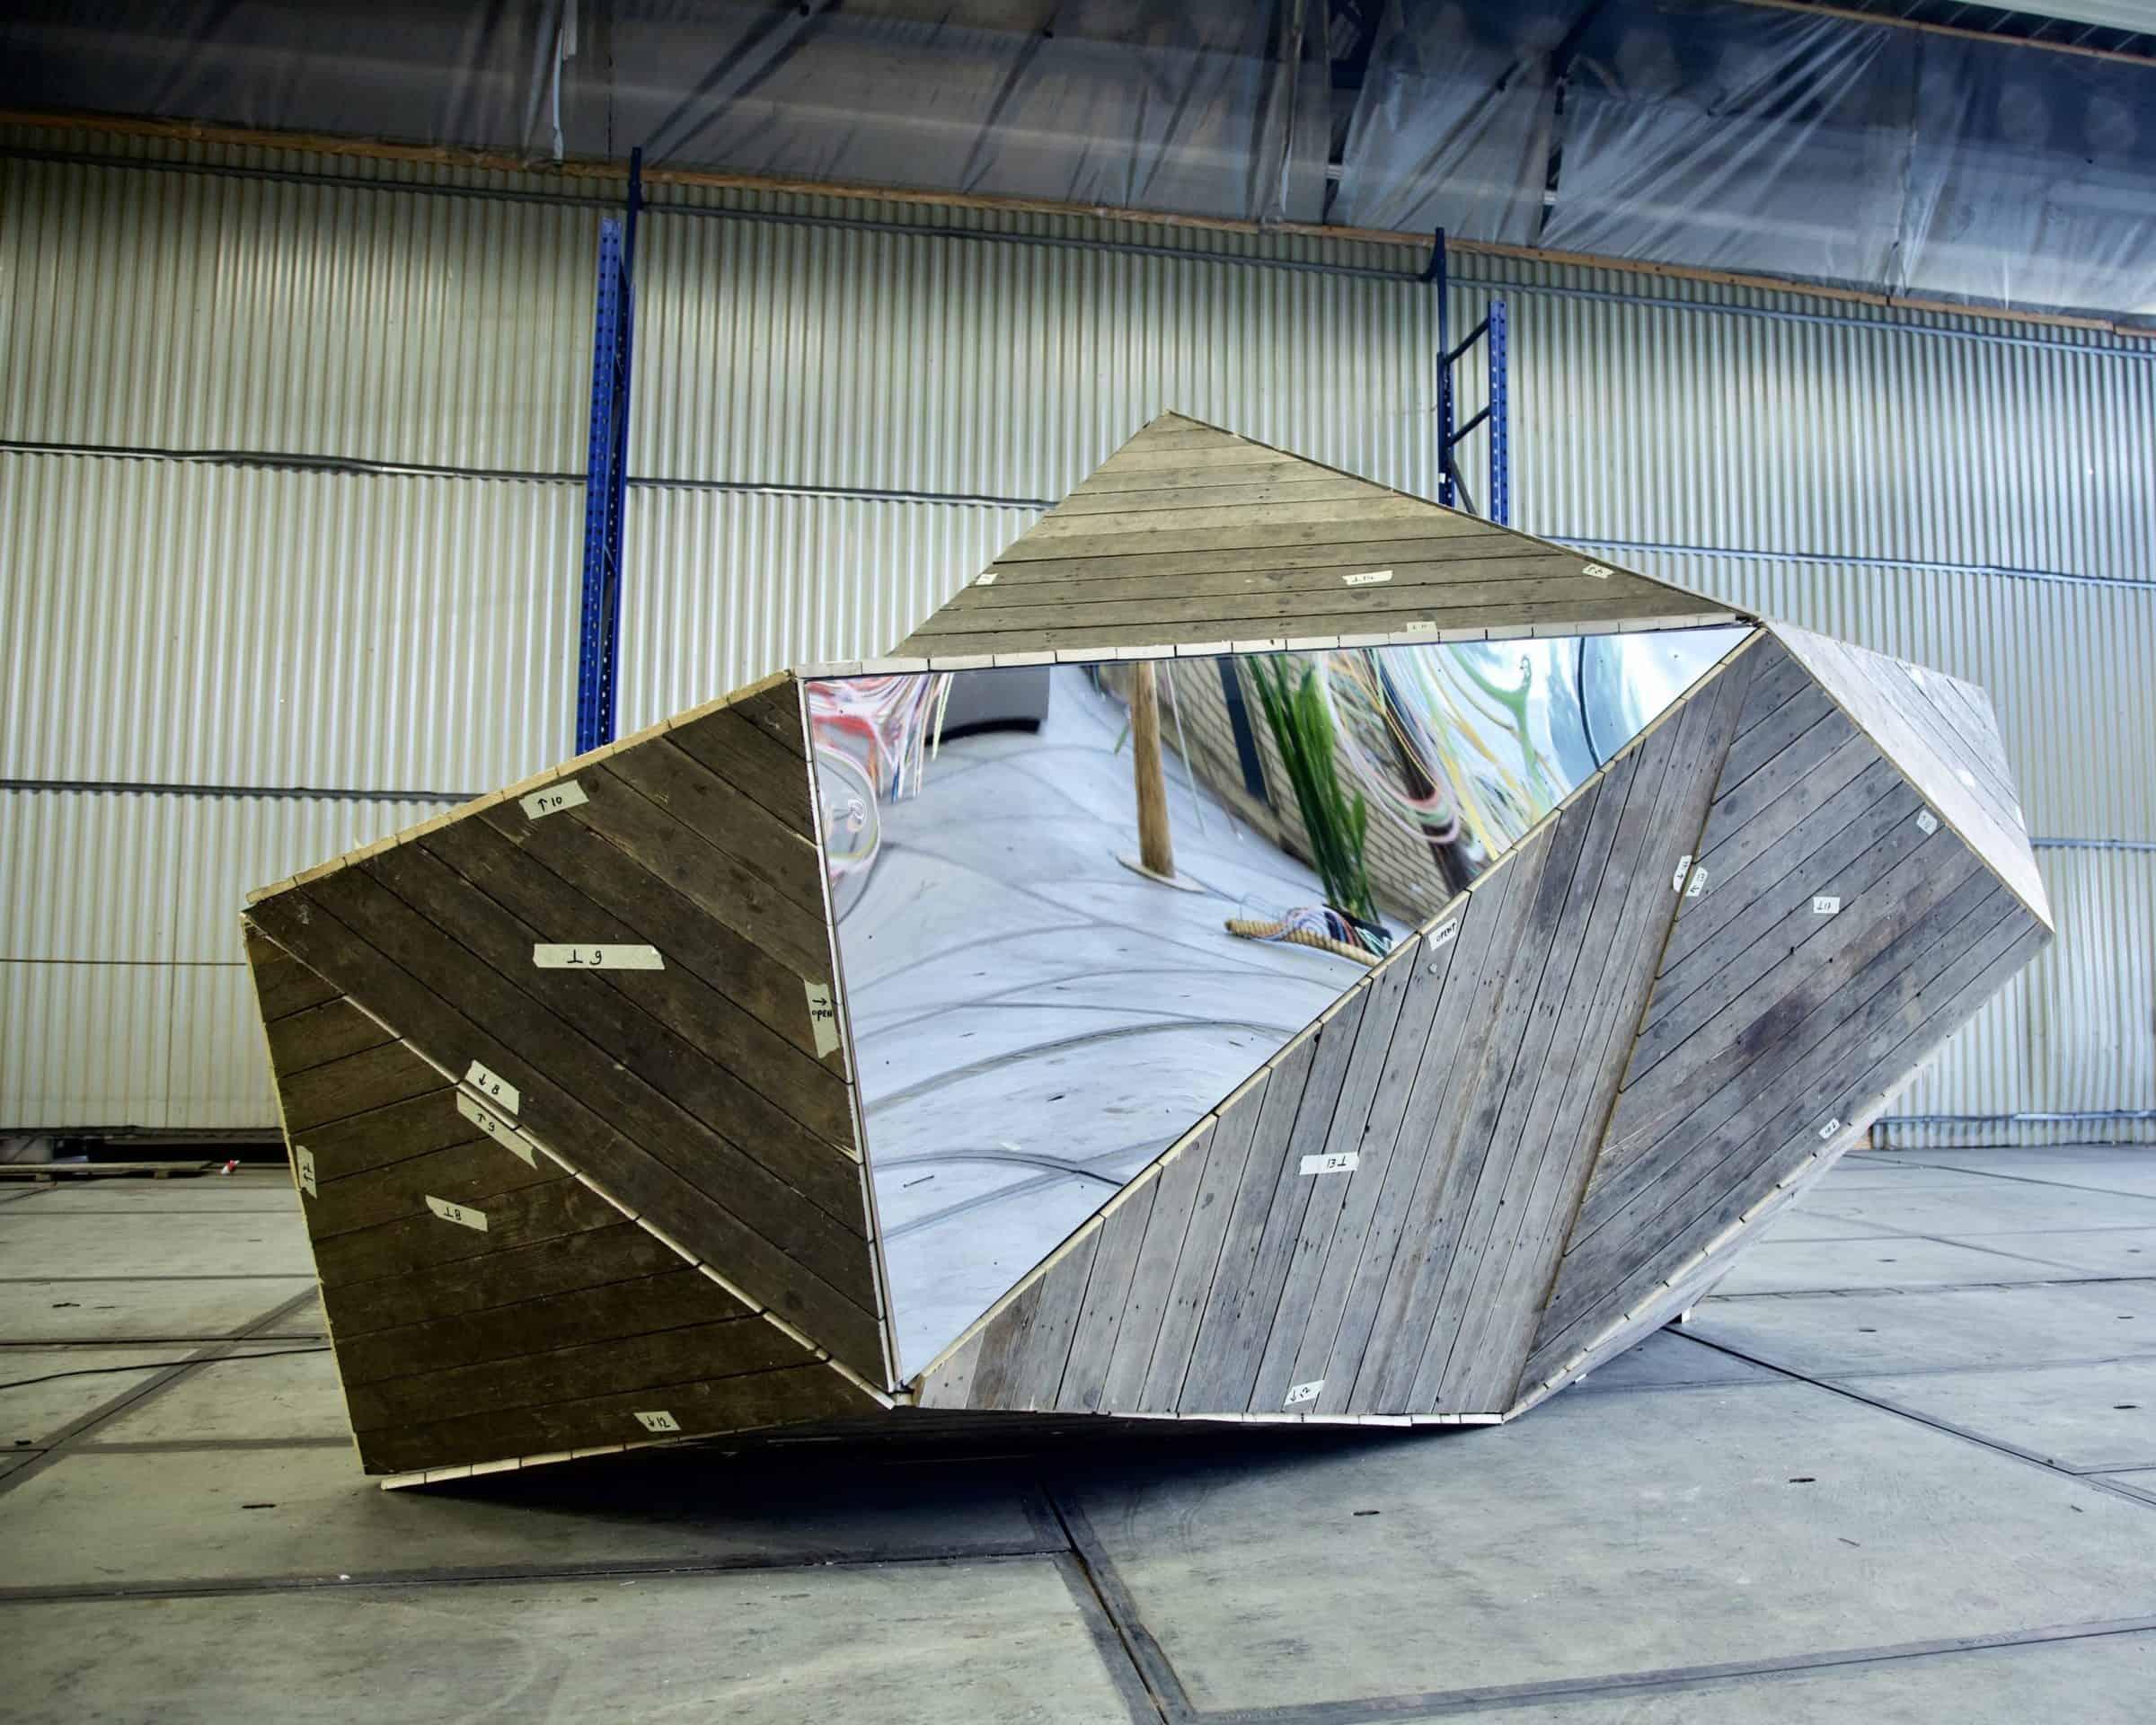 Spiegel object - Aldo Brinkhoff